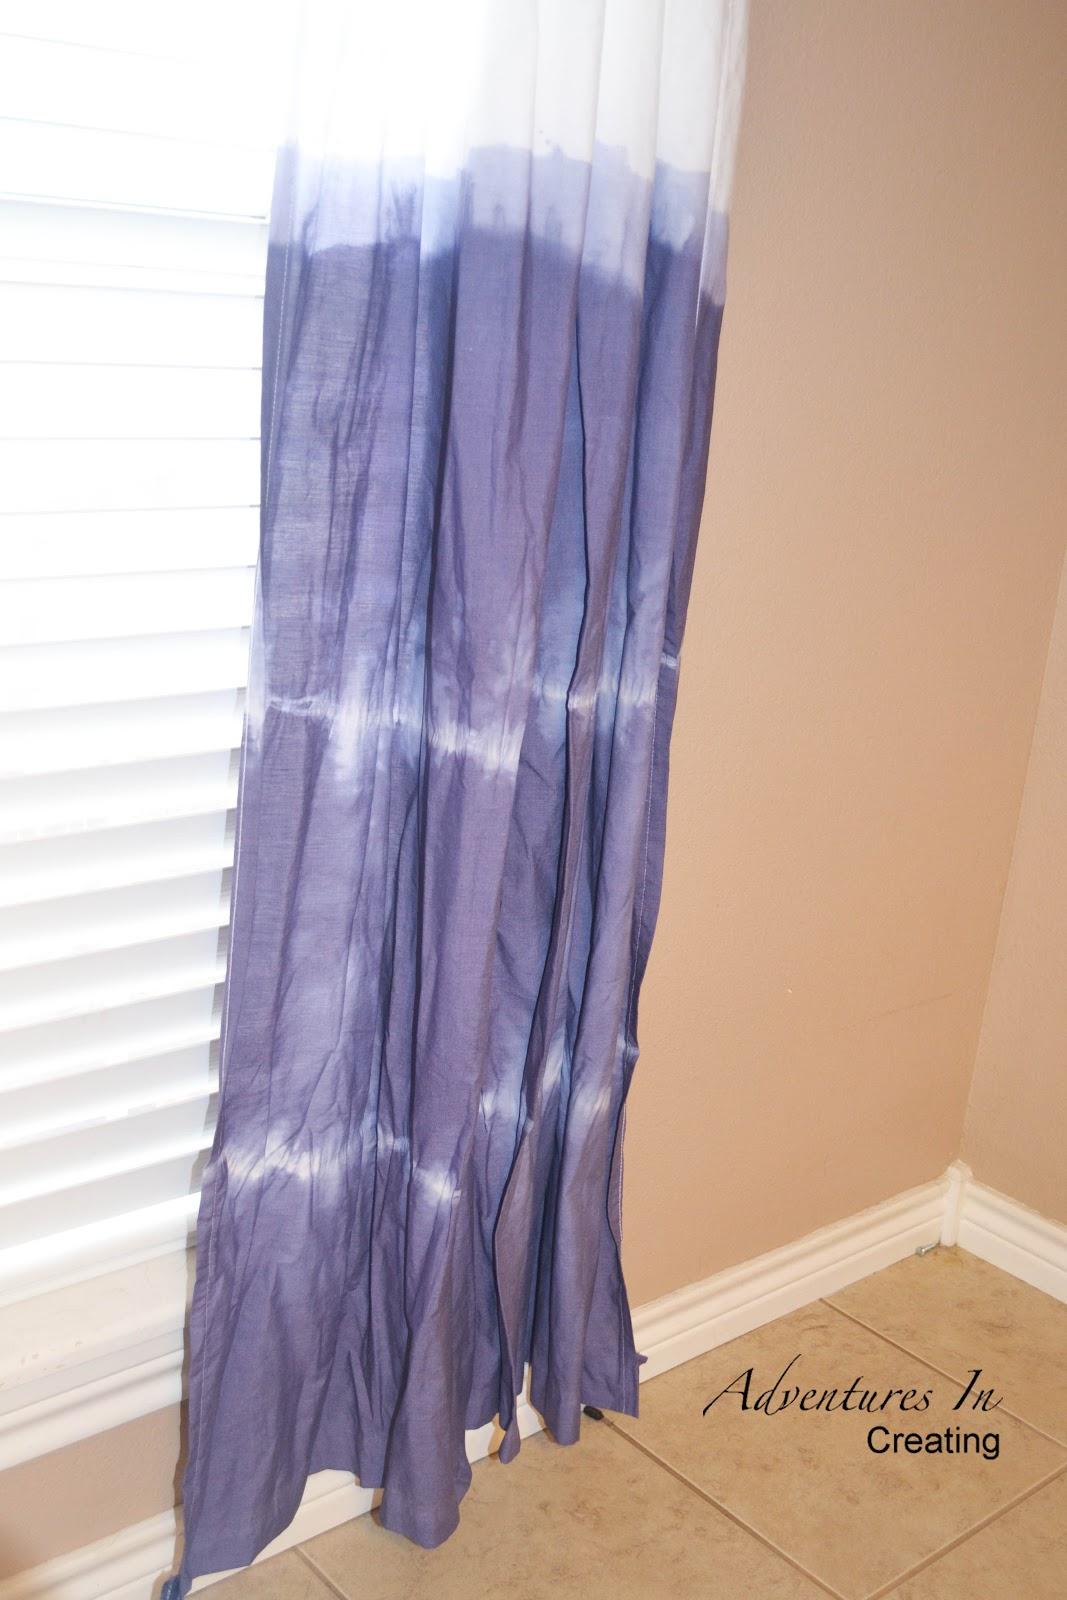 Adventures In Creating Easy Breezy Dip Dye Curtains